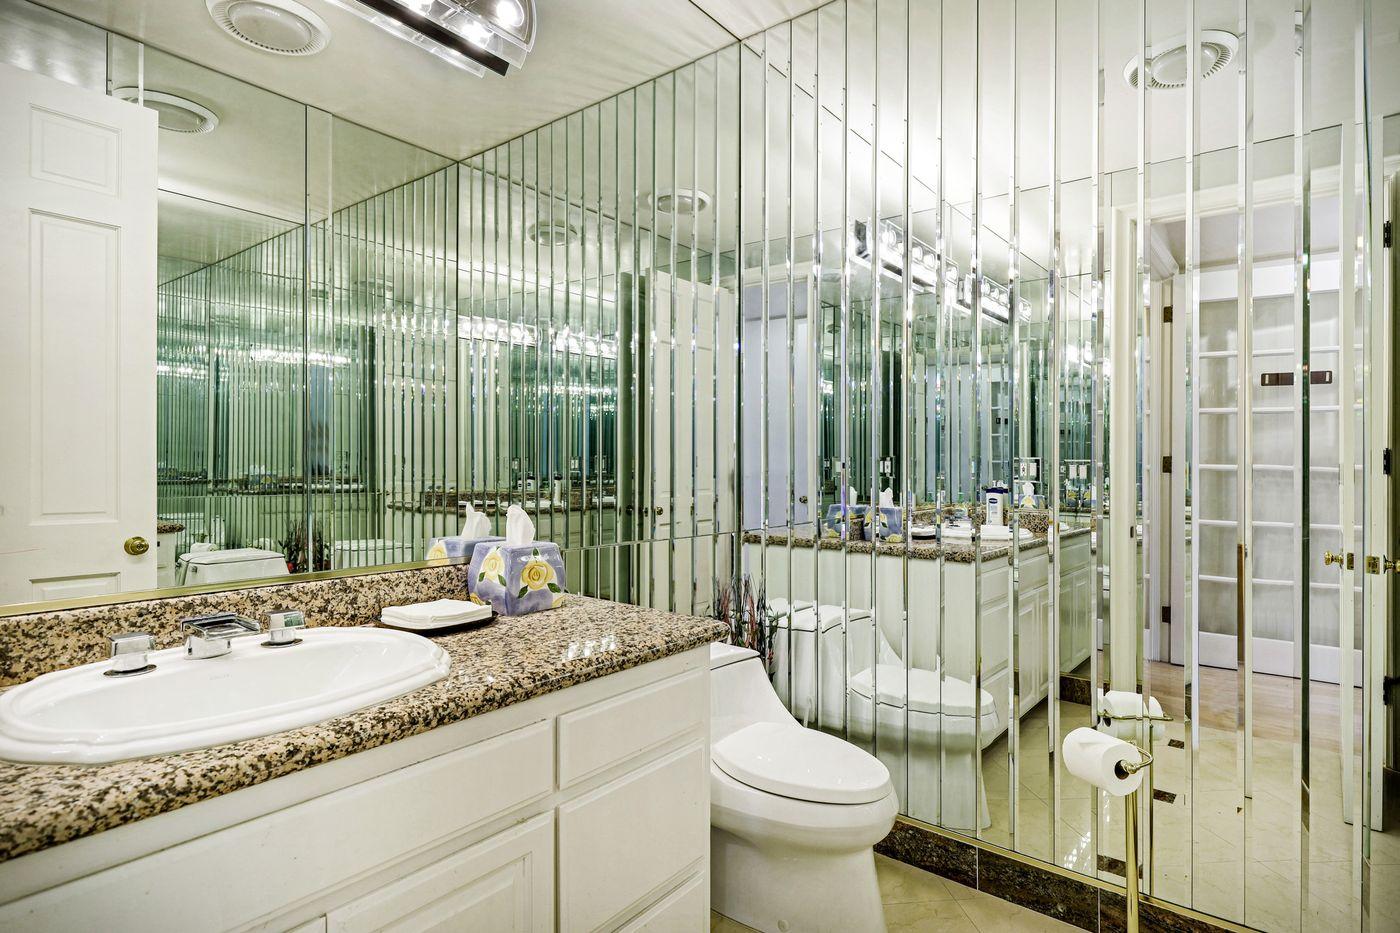 real-estate-photography-2245 Kingsbridge Ct-San Dimas-91773-airbnb-rental-interior-design-photographer-kasi-hyrapett-27